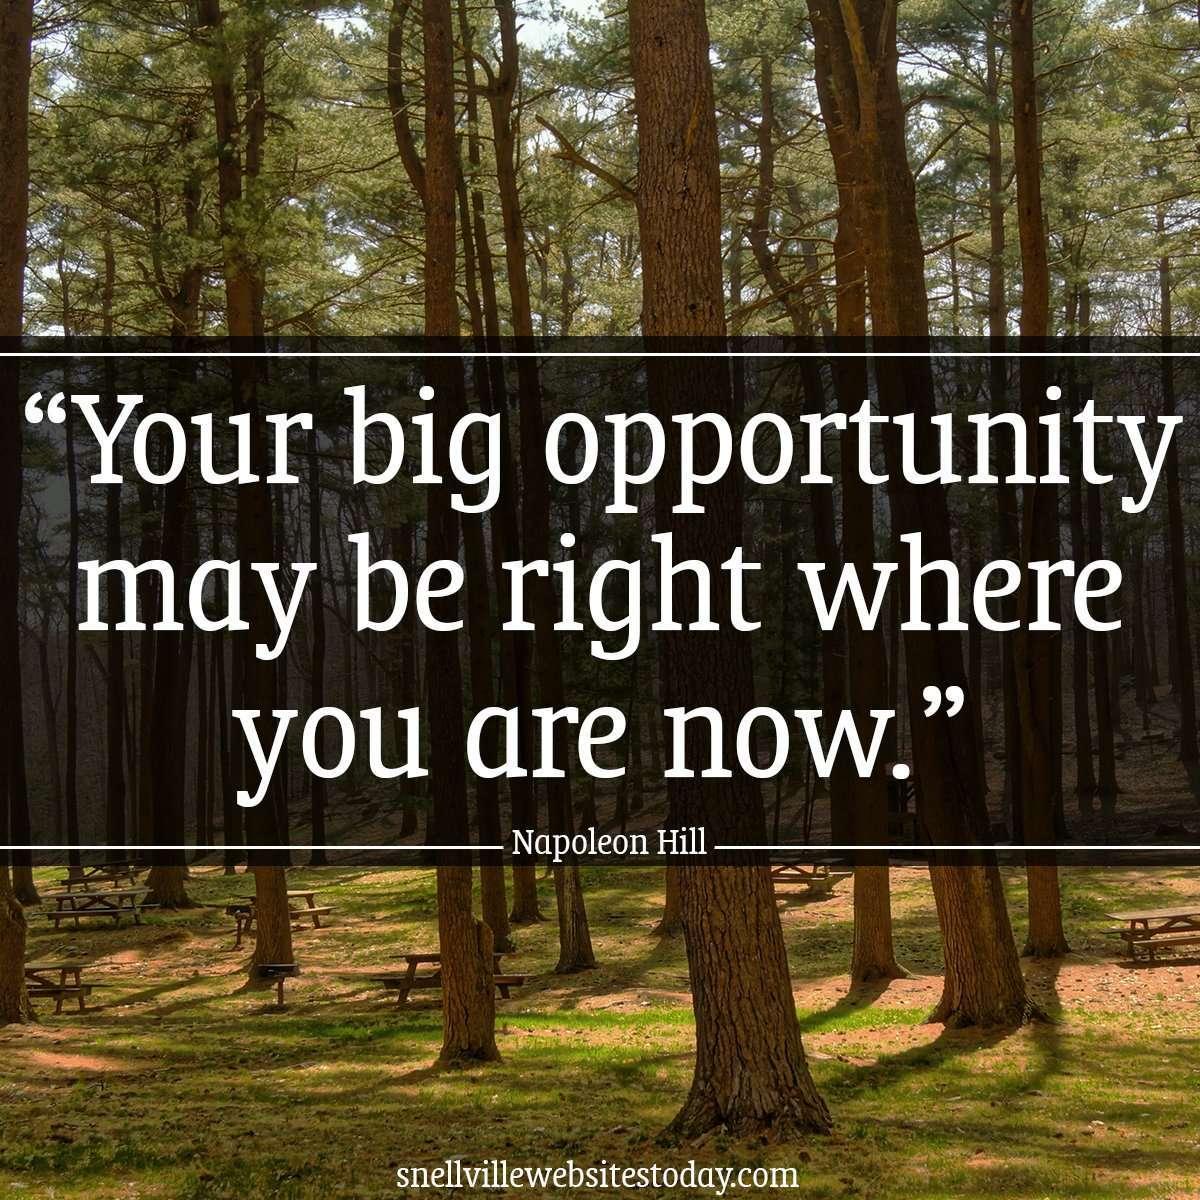 Website Design - Your big opportunity